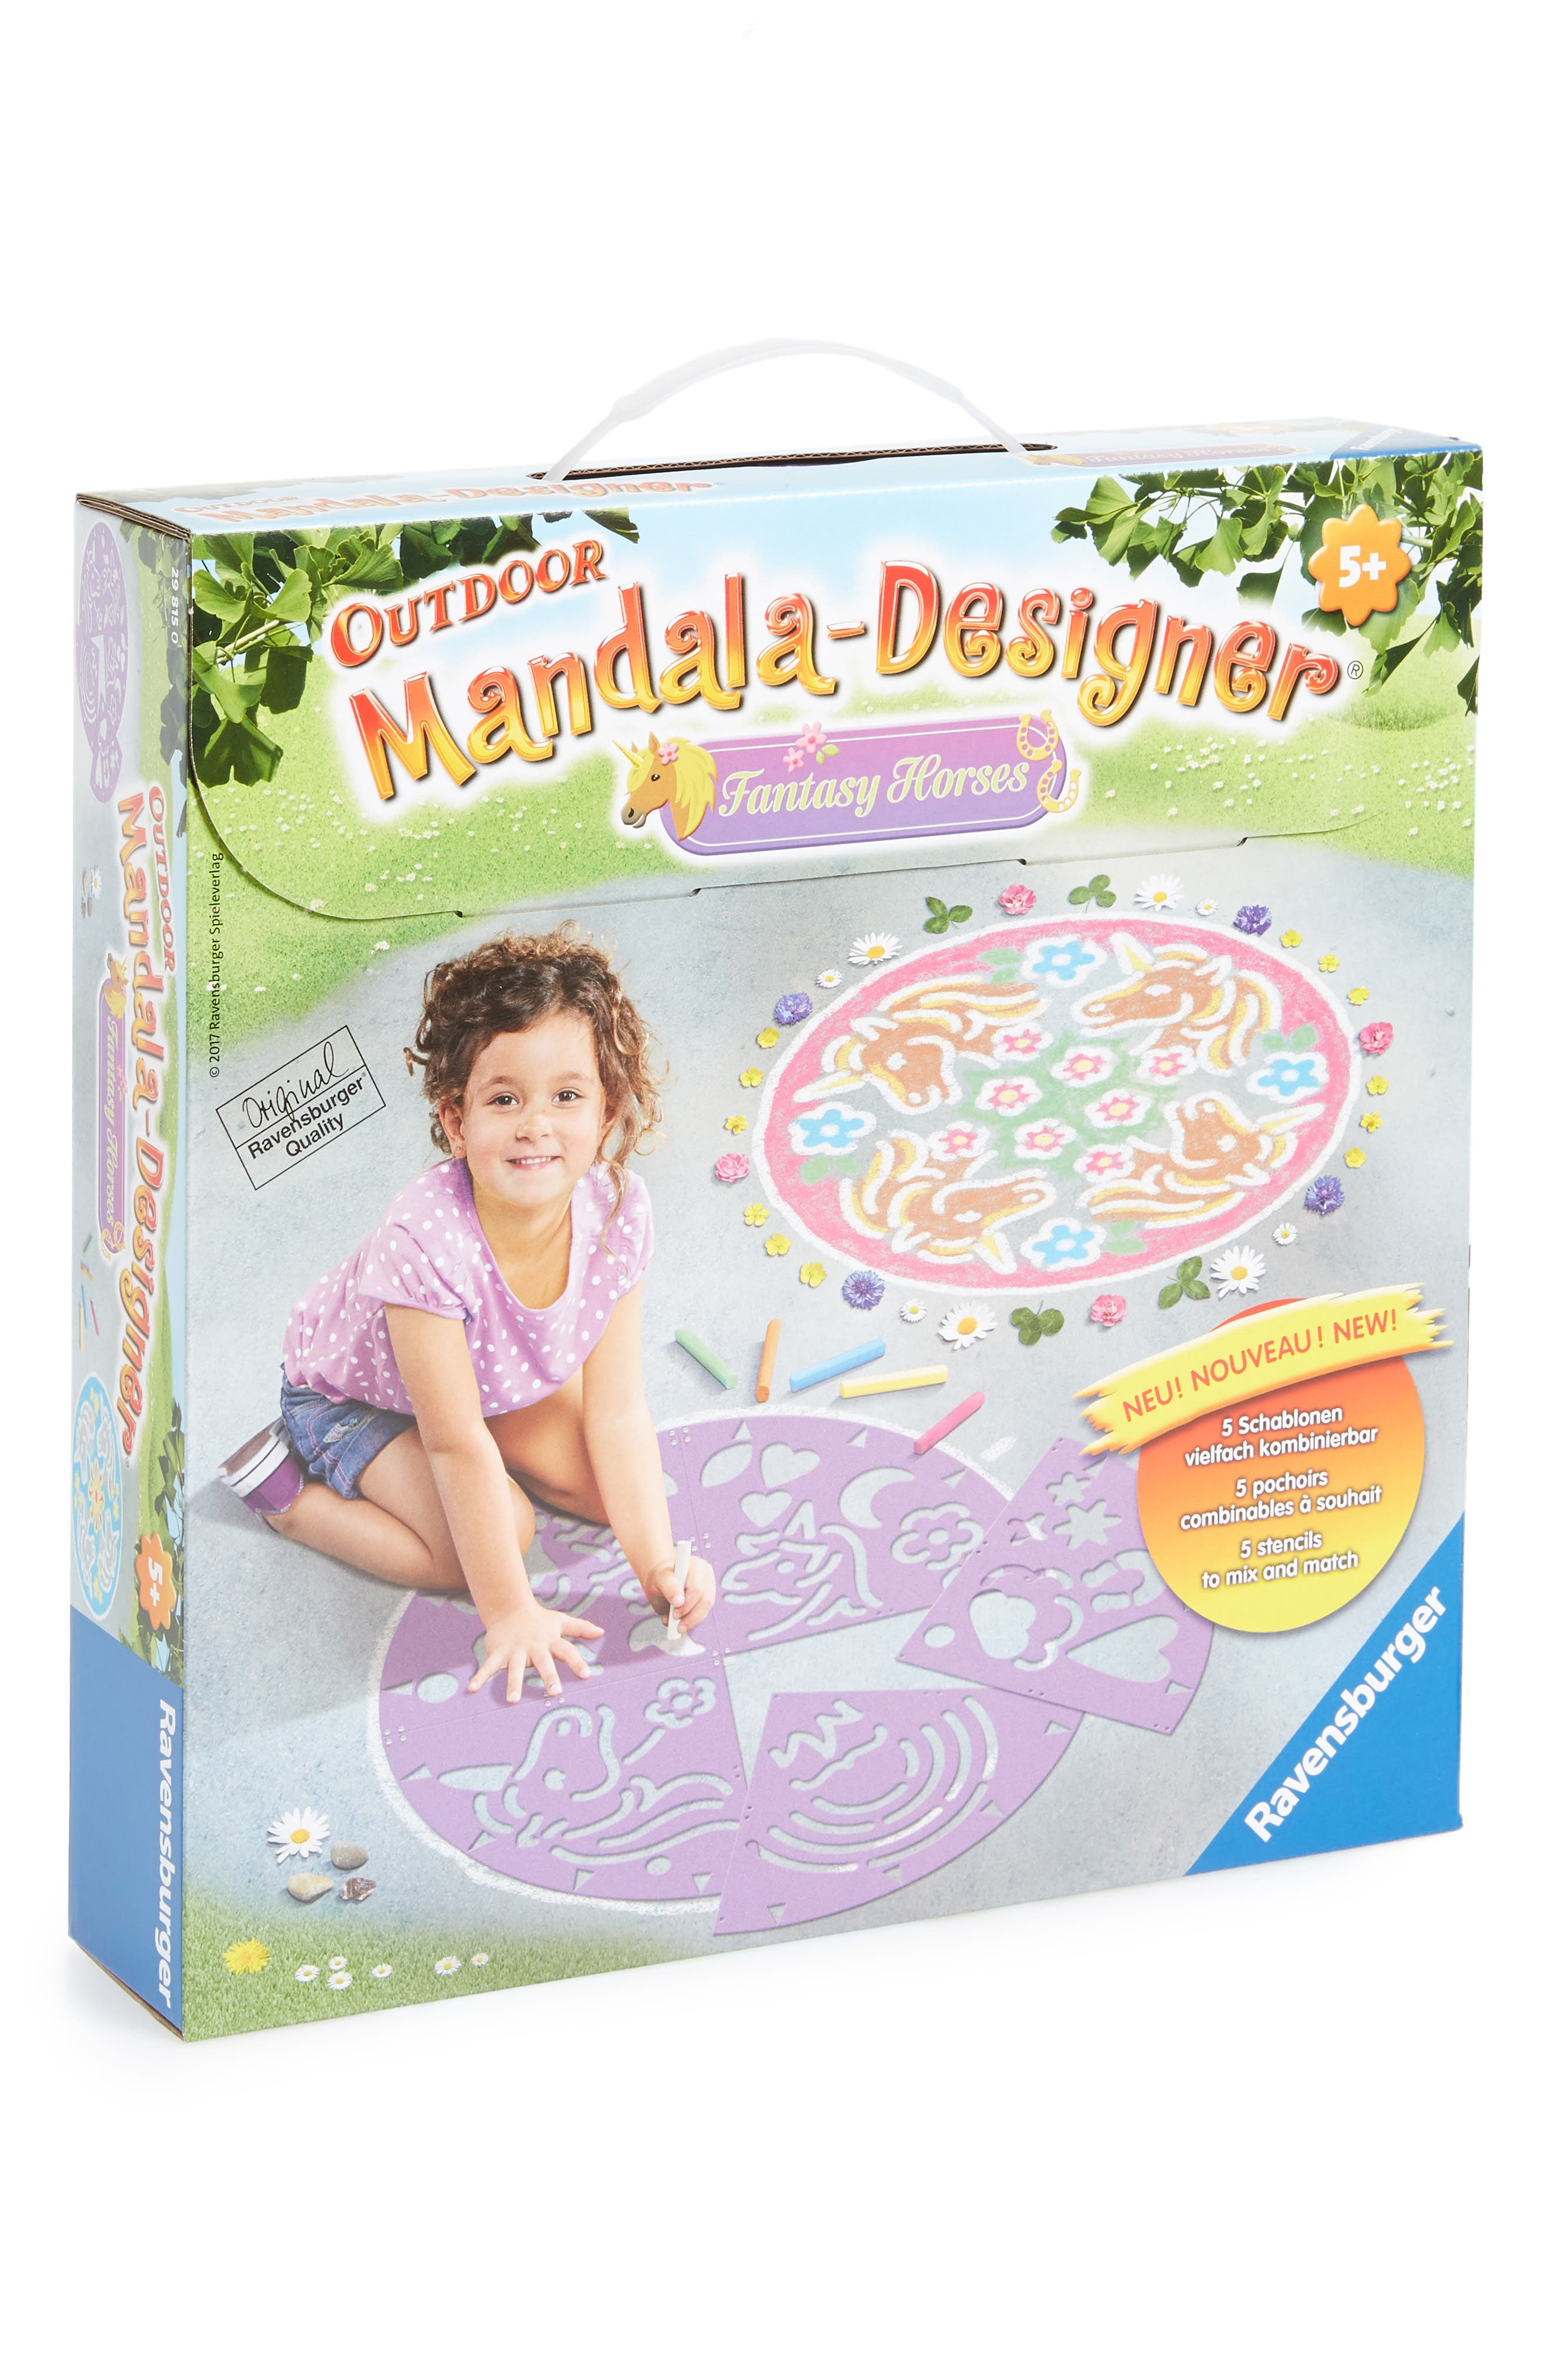 Outdoor Mandala Designer Fantasy Horses Chalk Kit,                             Main thumbnail 1, color,                             500